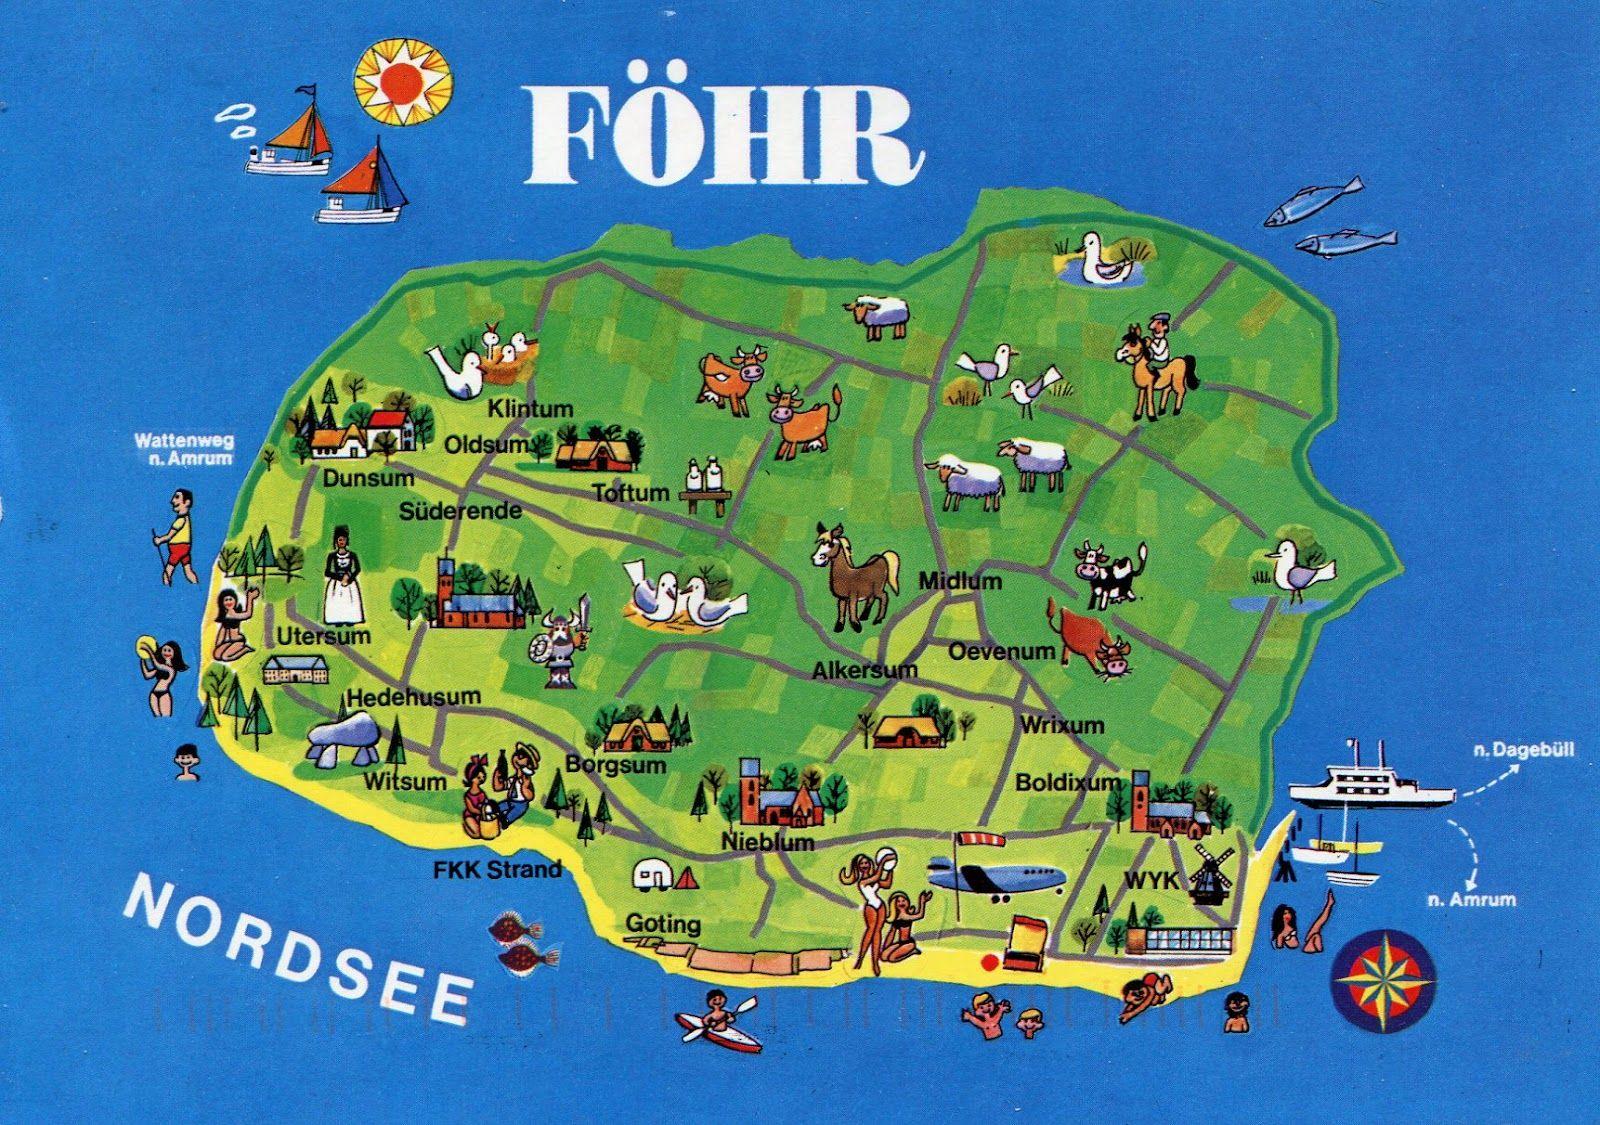 Insel Fohr Illustrated Nordseeinseln Fohr Insel Amrum